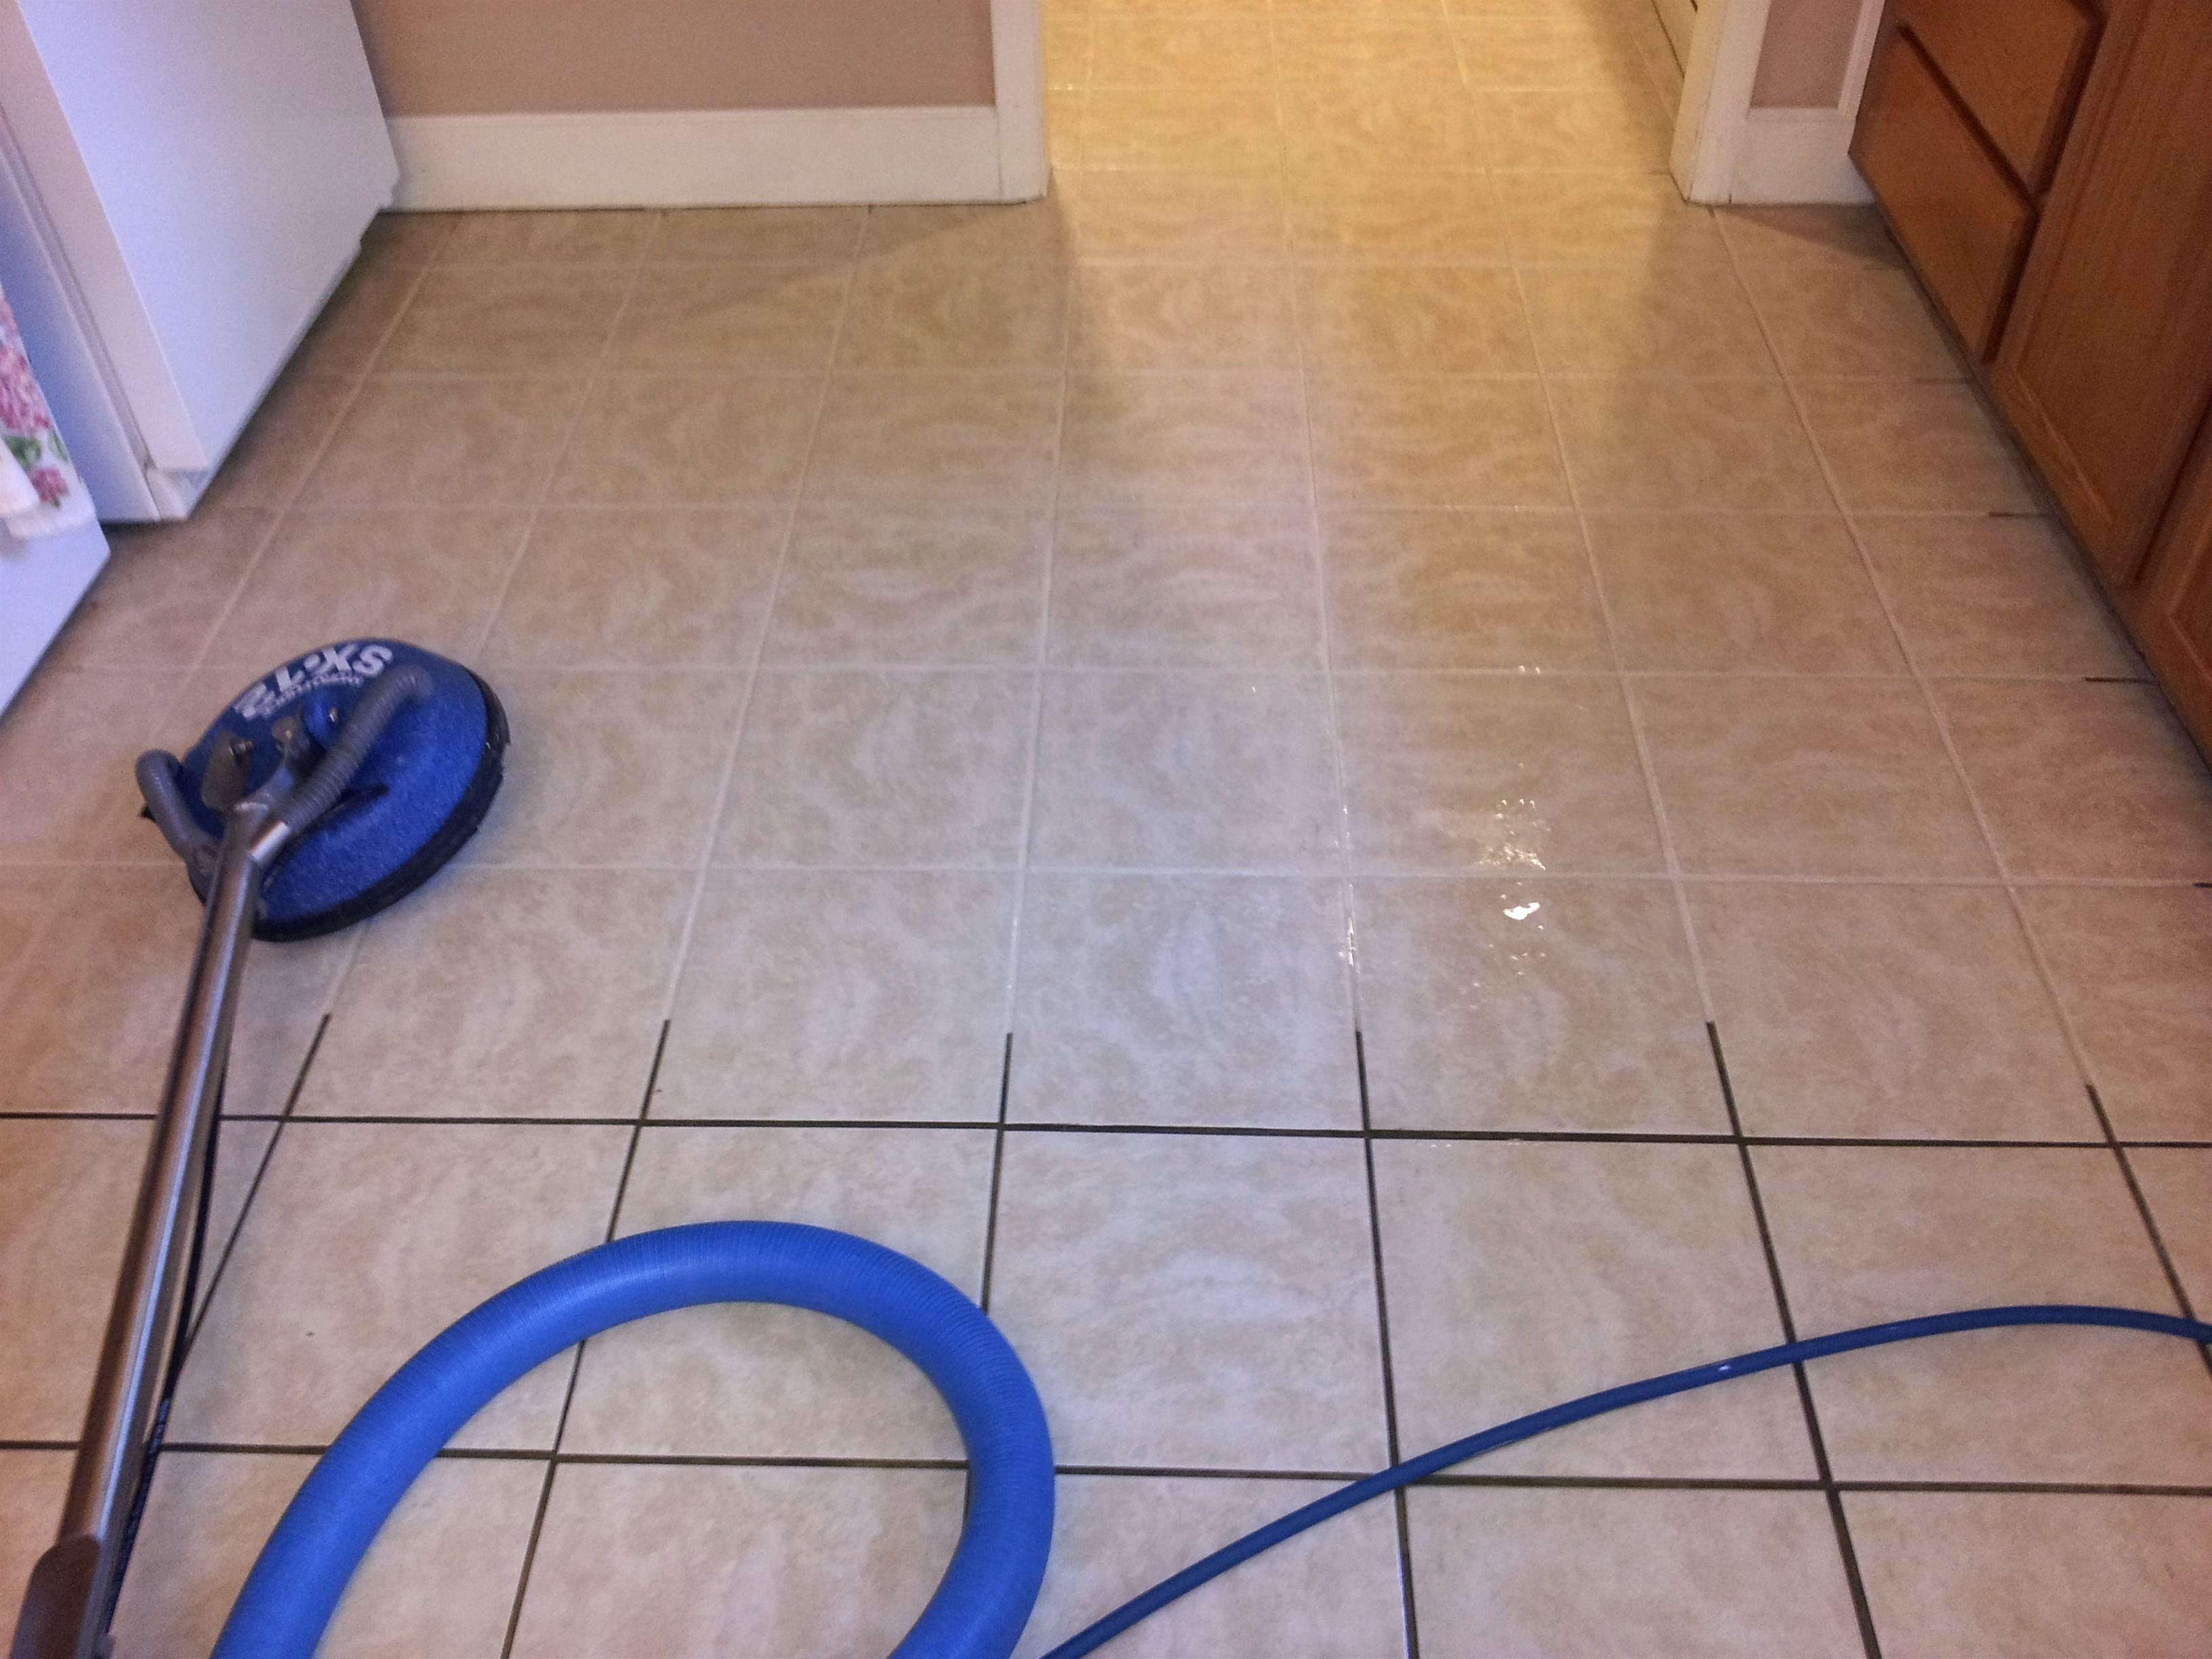 Best Way To Disinfect Kitchen Floor Httpwebtopcom - How to protect ceramic tile floors